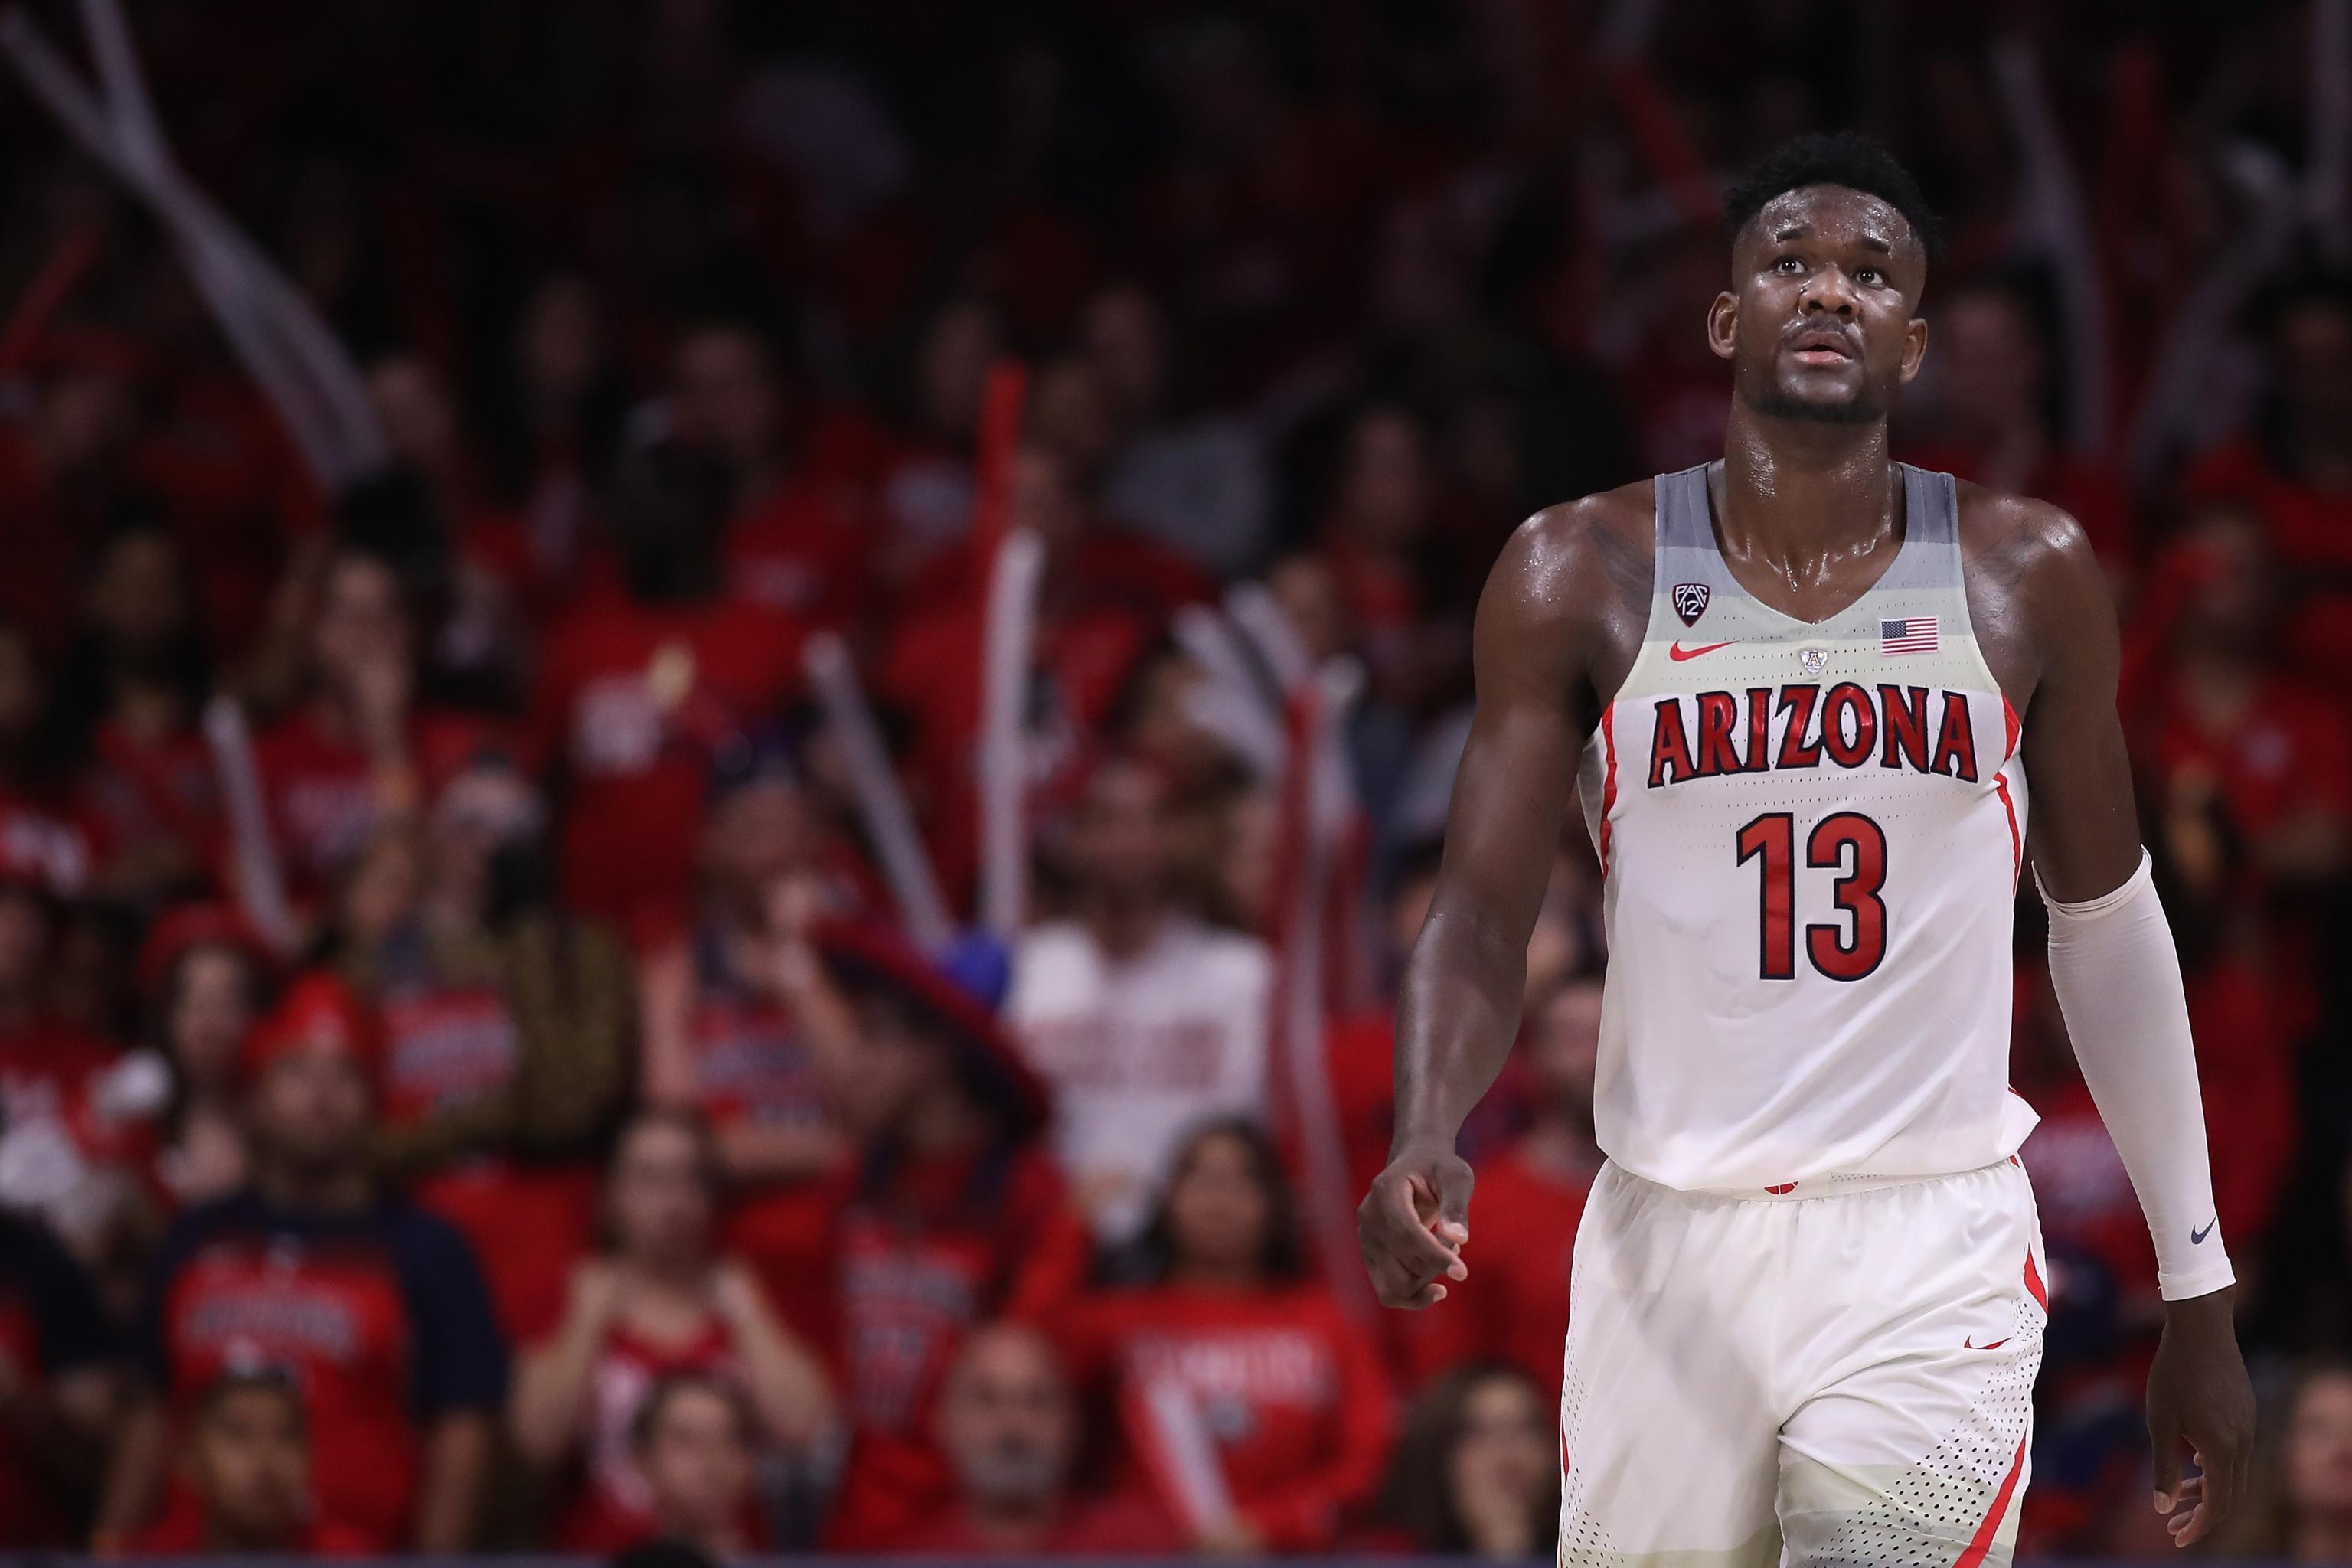 official photos 5ab20 96d02 How Arizona's Deandre Ayton Can Lock Up the No. 1 NBA Draft ...